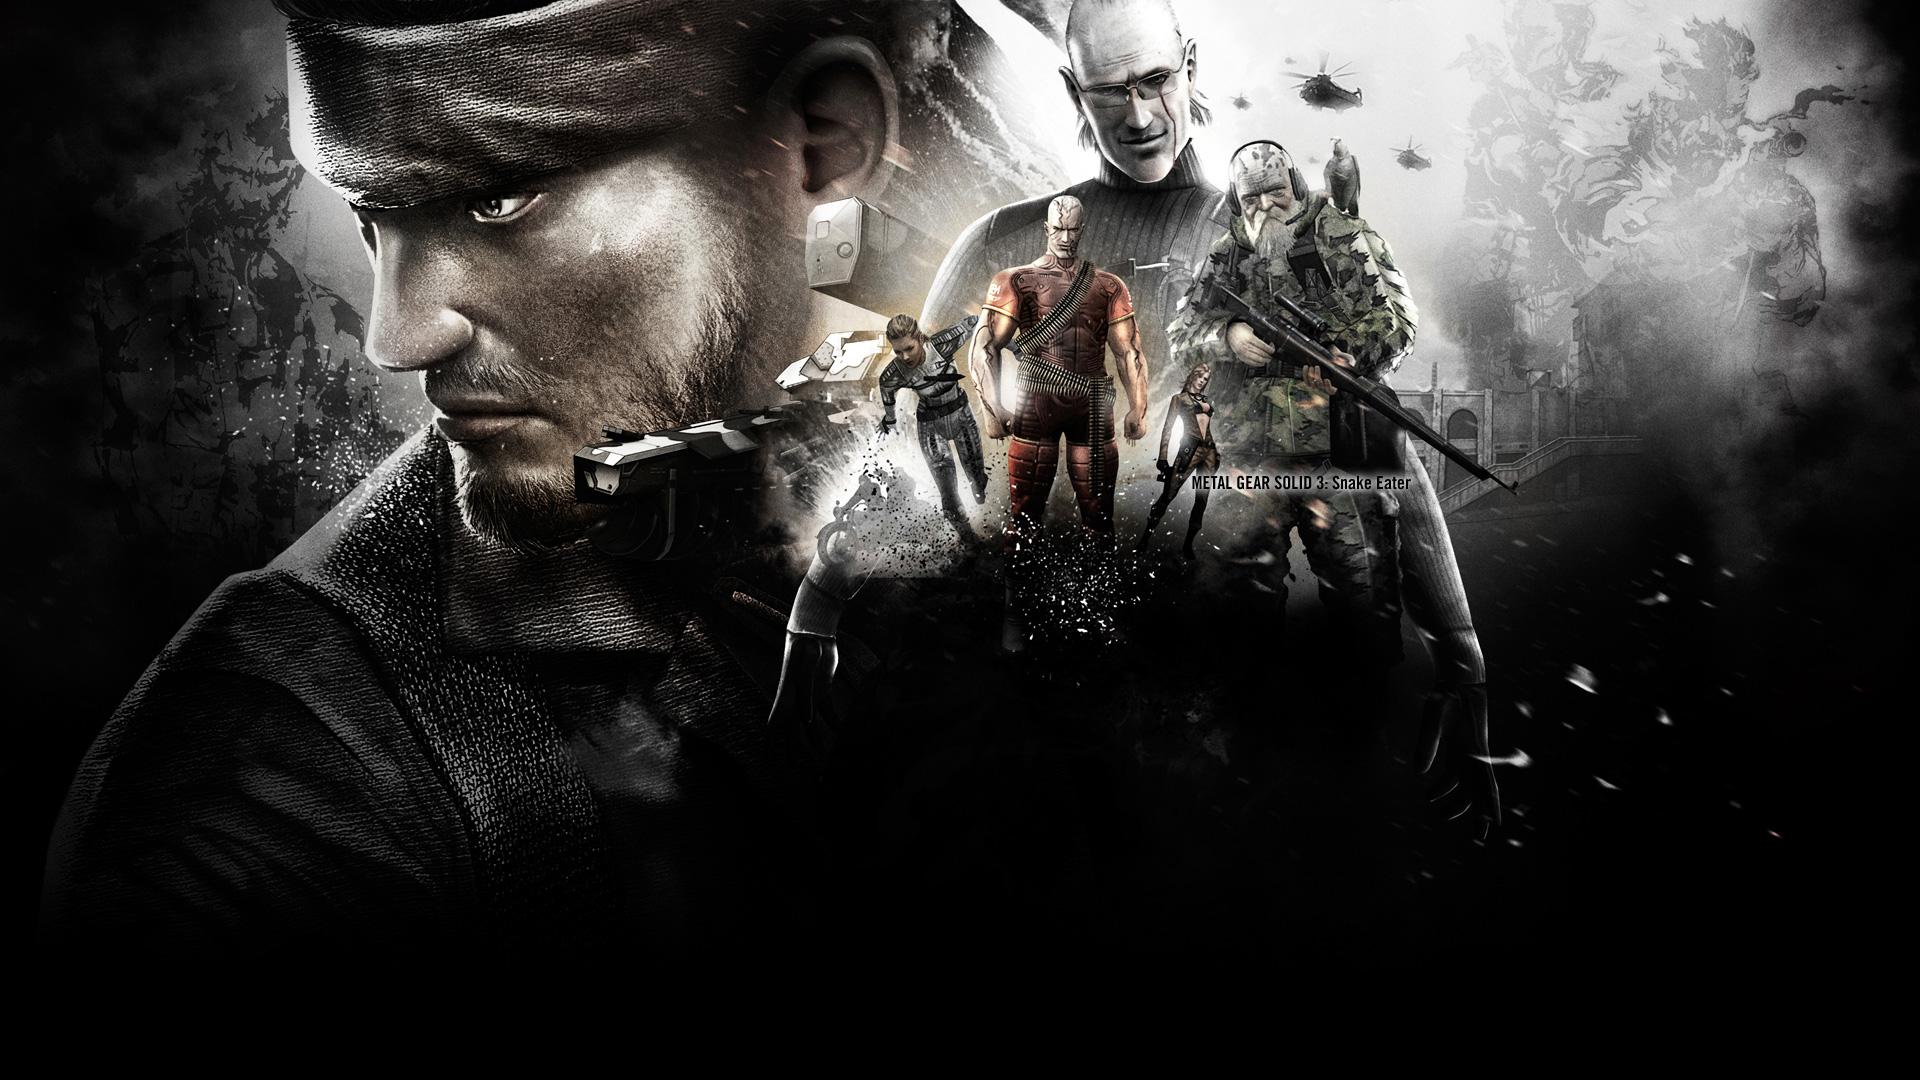 Free Download Metal Gear Wallpaper 1920x1080 Metal Gear